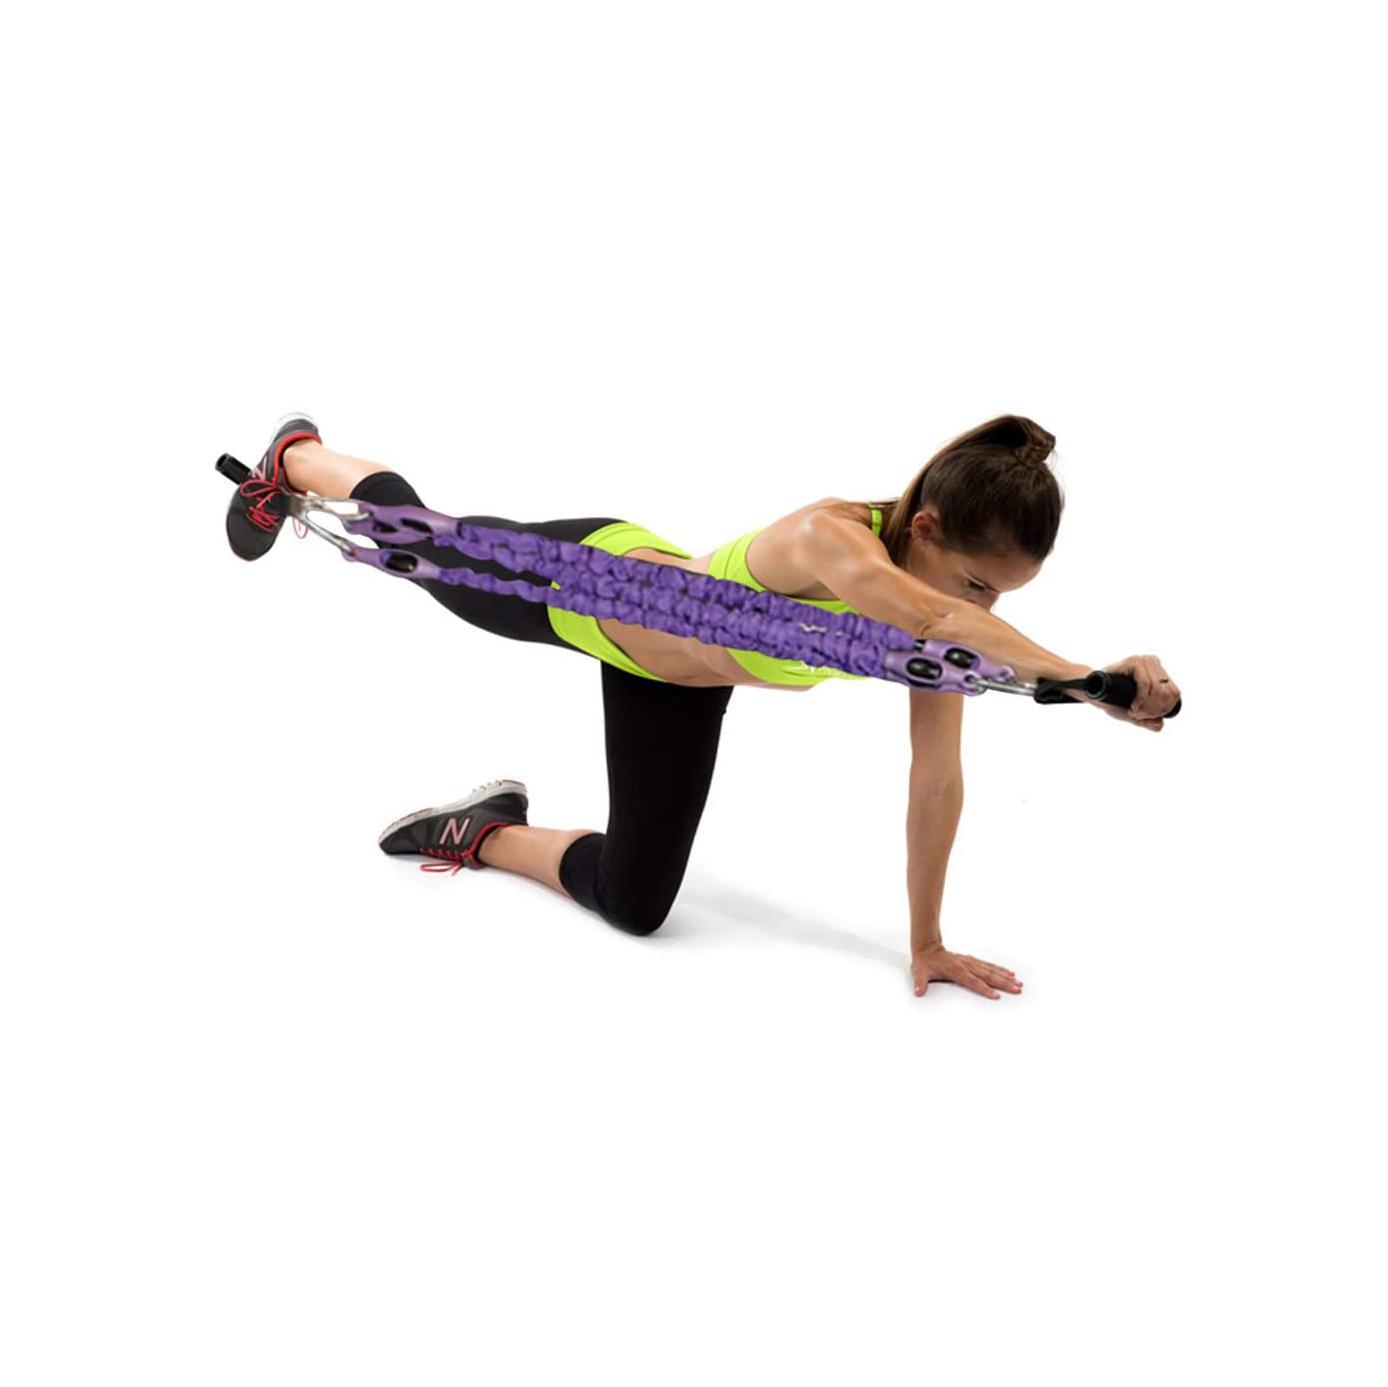 Elastic Sit Up Pull Rope Spring Tension Foot Pedal Abdomen Leg Exerciser